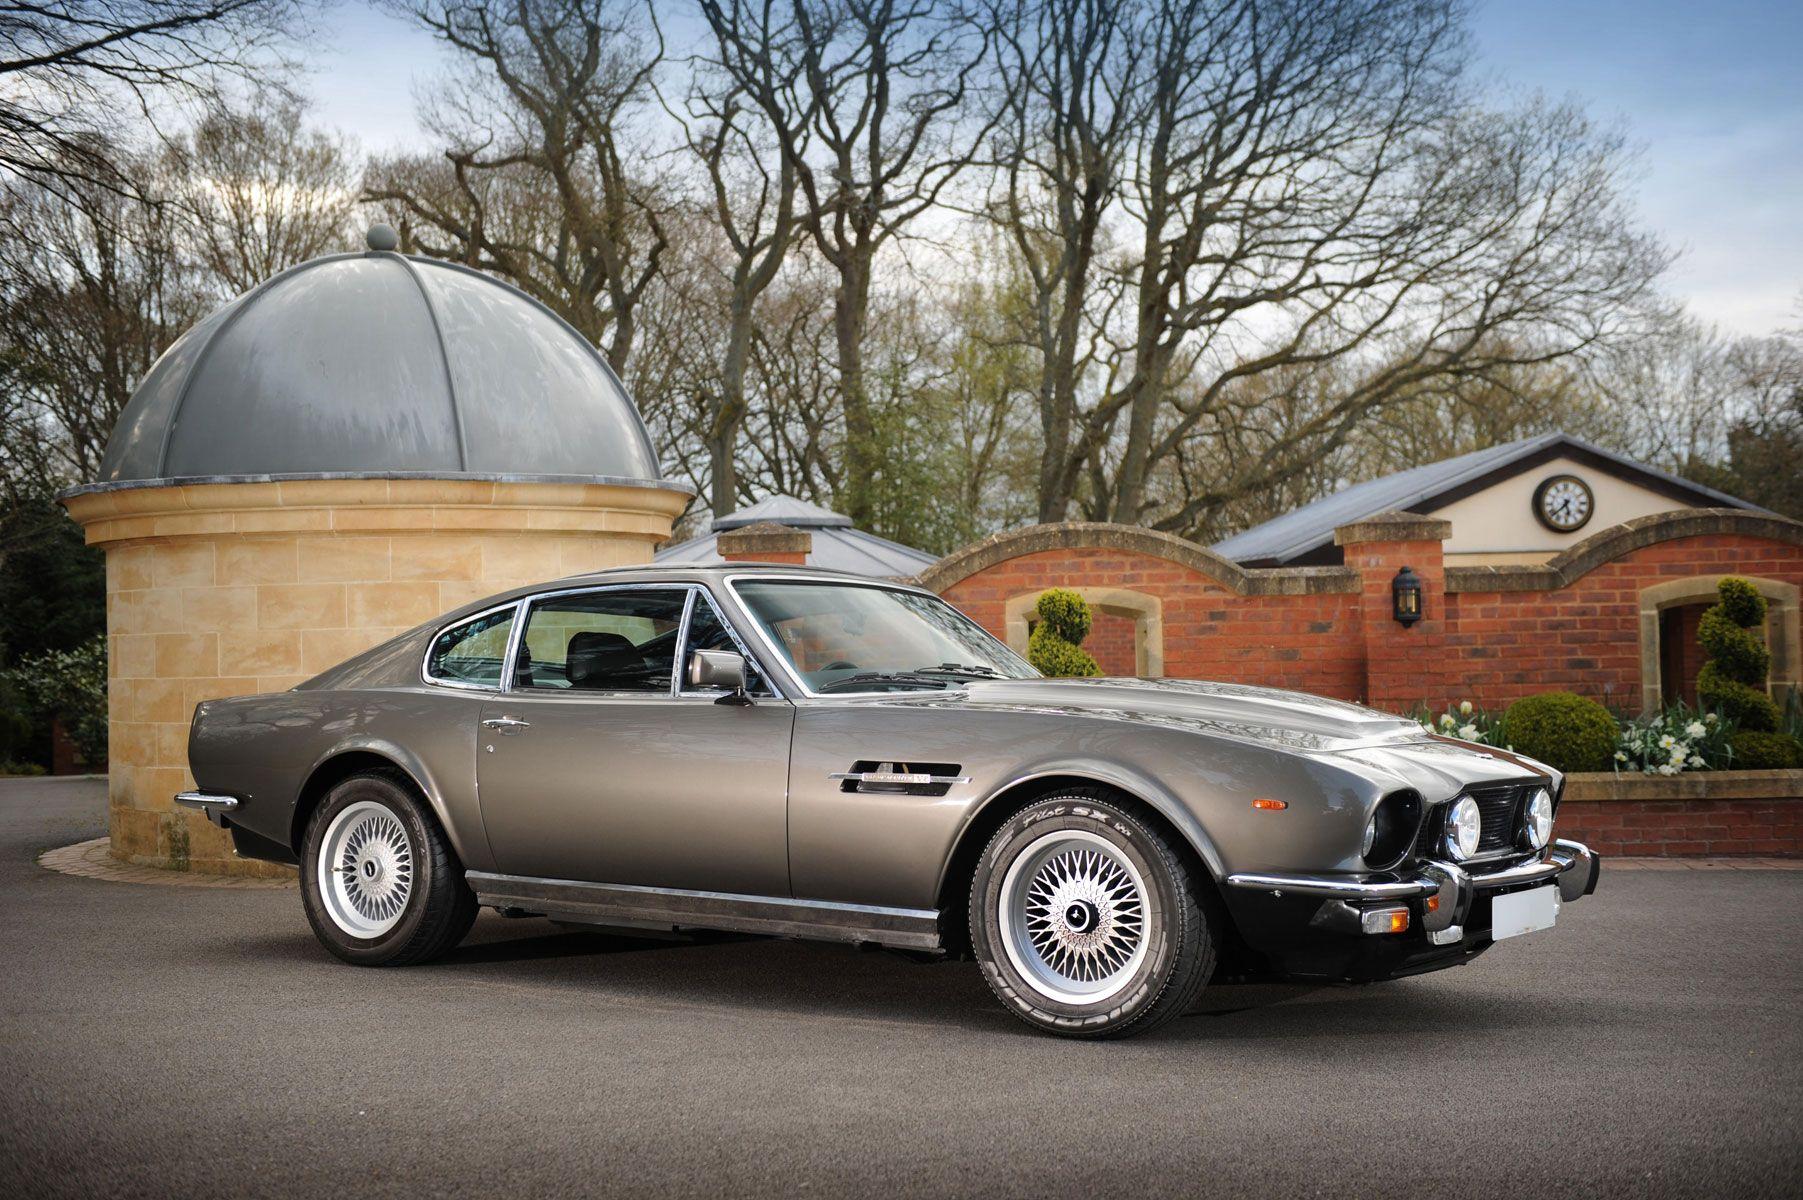 Vantage Saloon James Bond Special Edition 1985 Bond Cars Aston Martin Cars Aston Martin